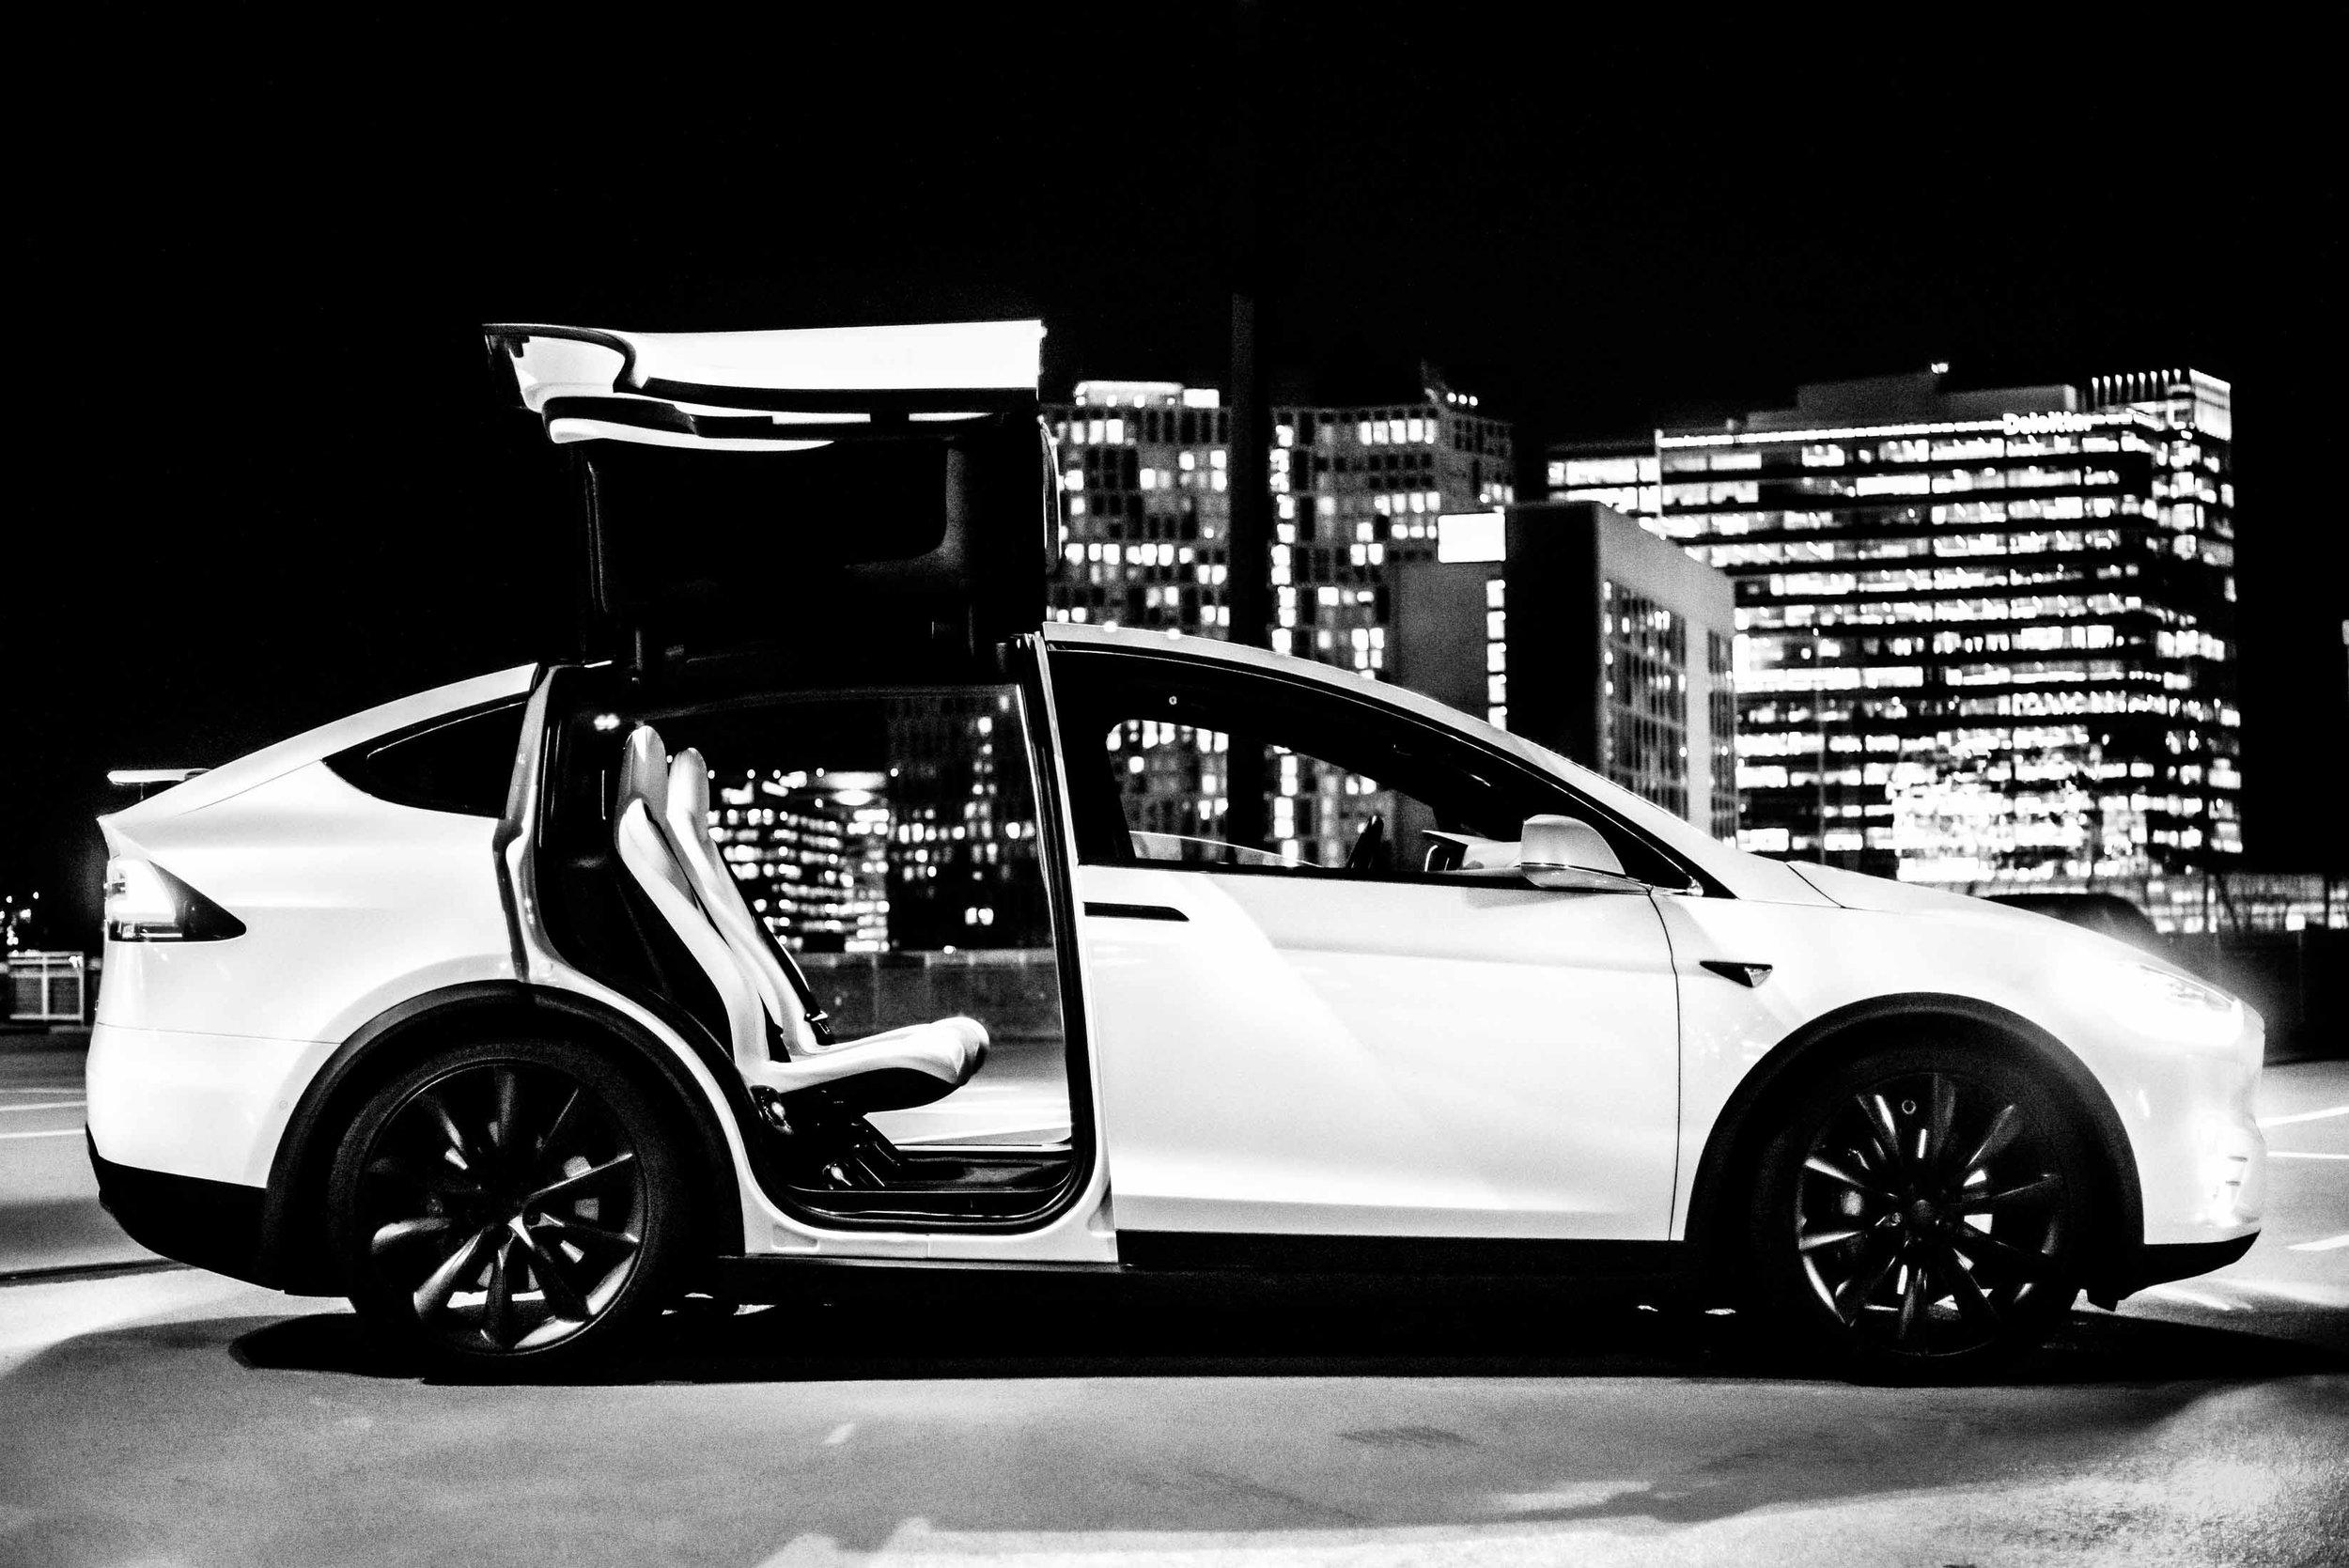 fleet+vehicle+sexy+car+photo+video+speed+tesla+p100d+vadym+guliuk+photography-10.jpg